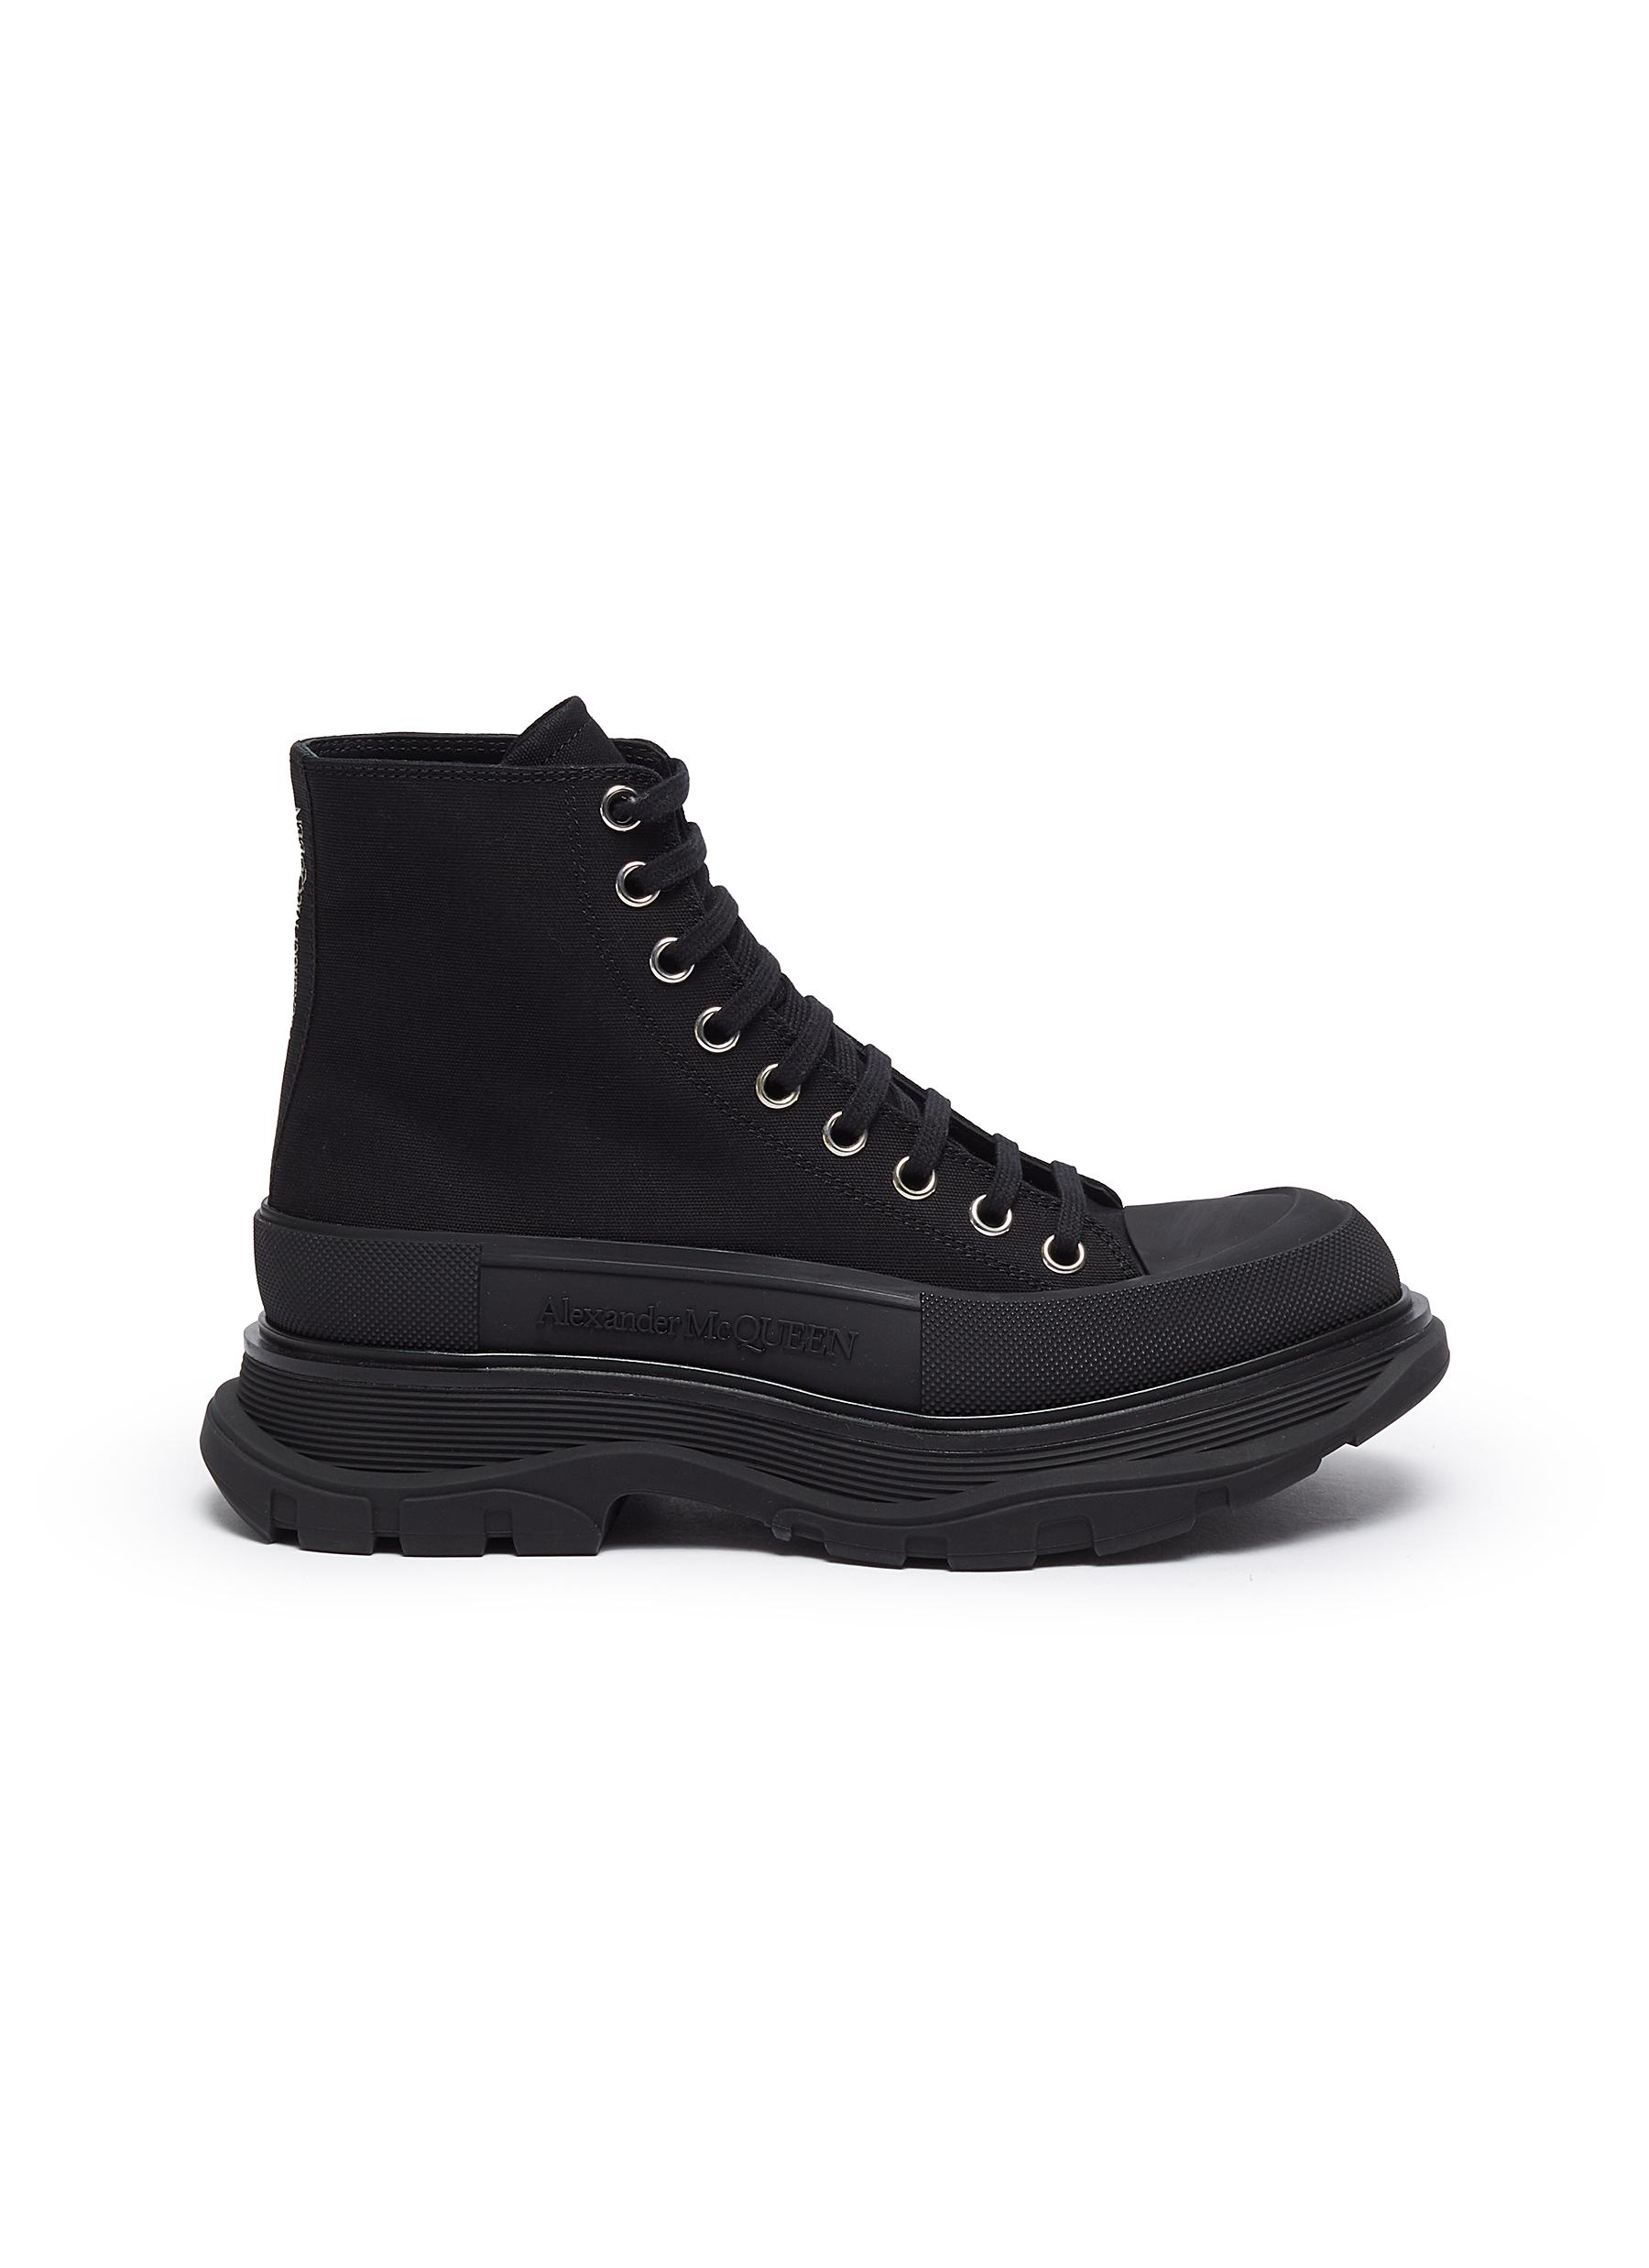 'Tread Slick' Platform Sole Round Toe Boots